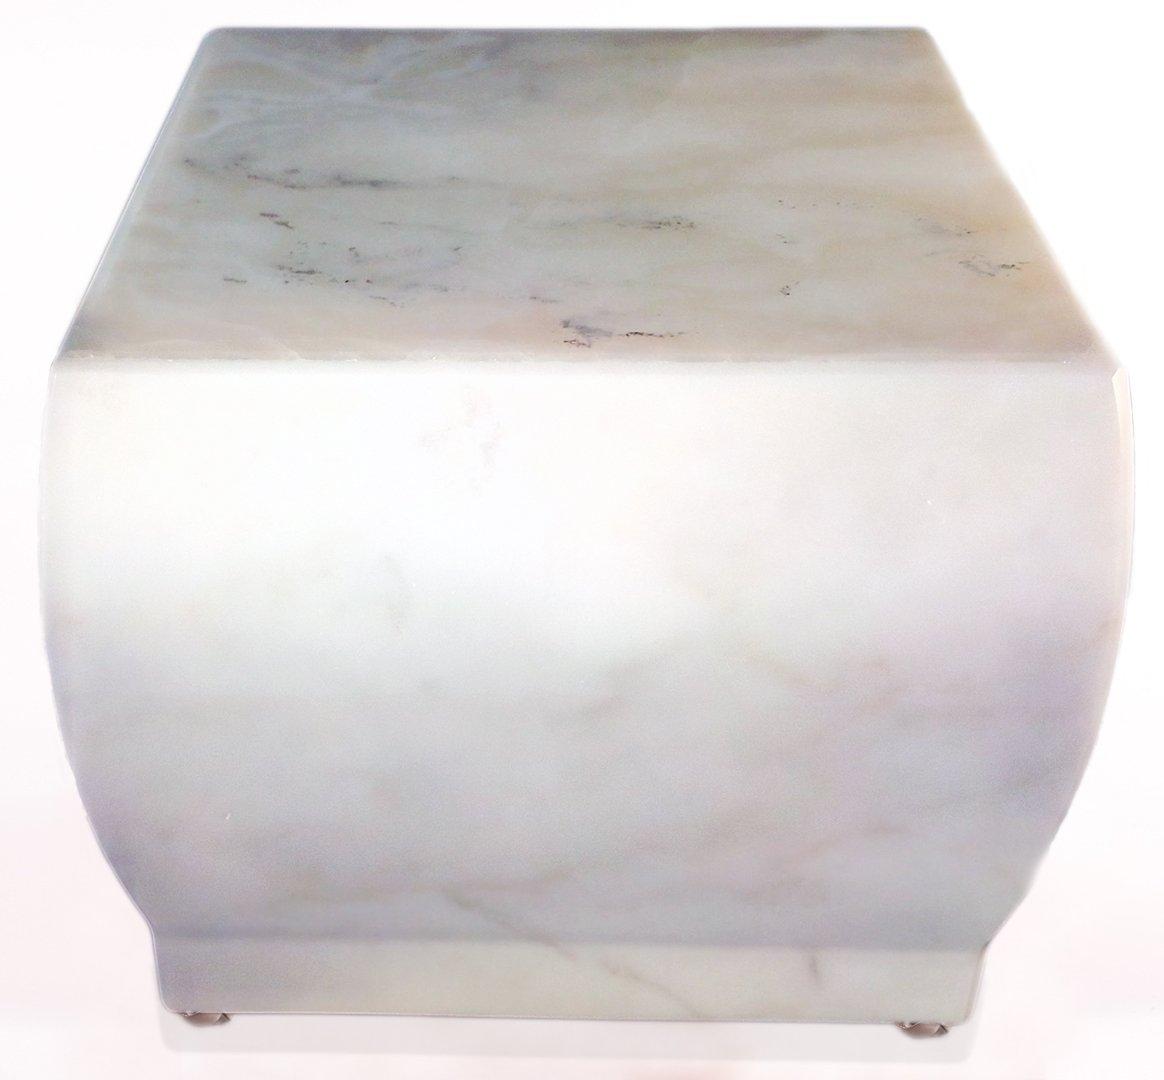 Urna funeraria Astro - Linea All White - asilvy: Amazon.es: Hogar